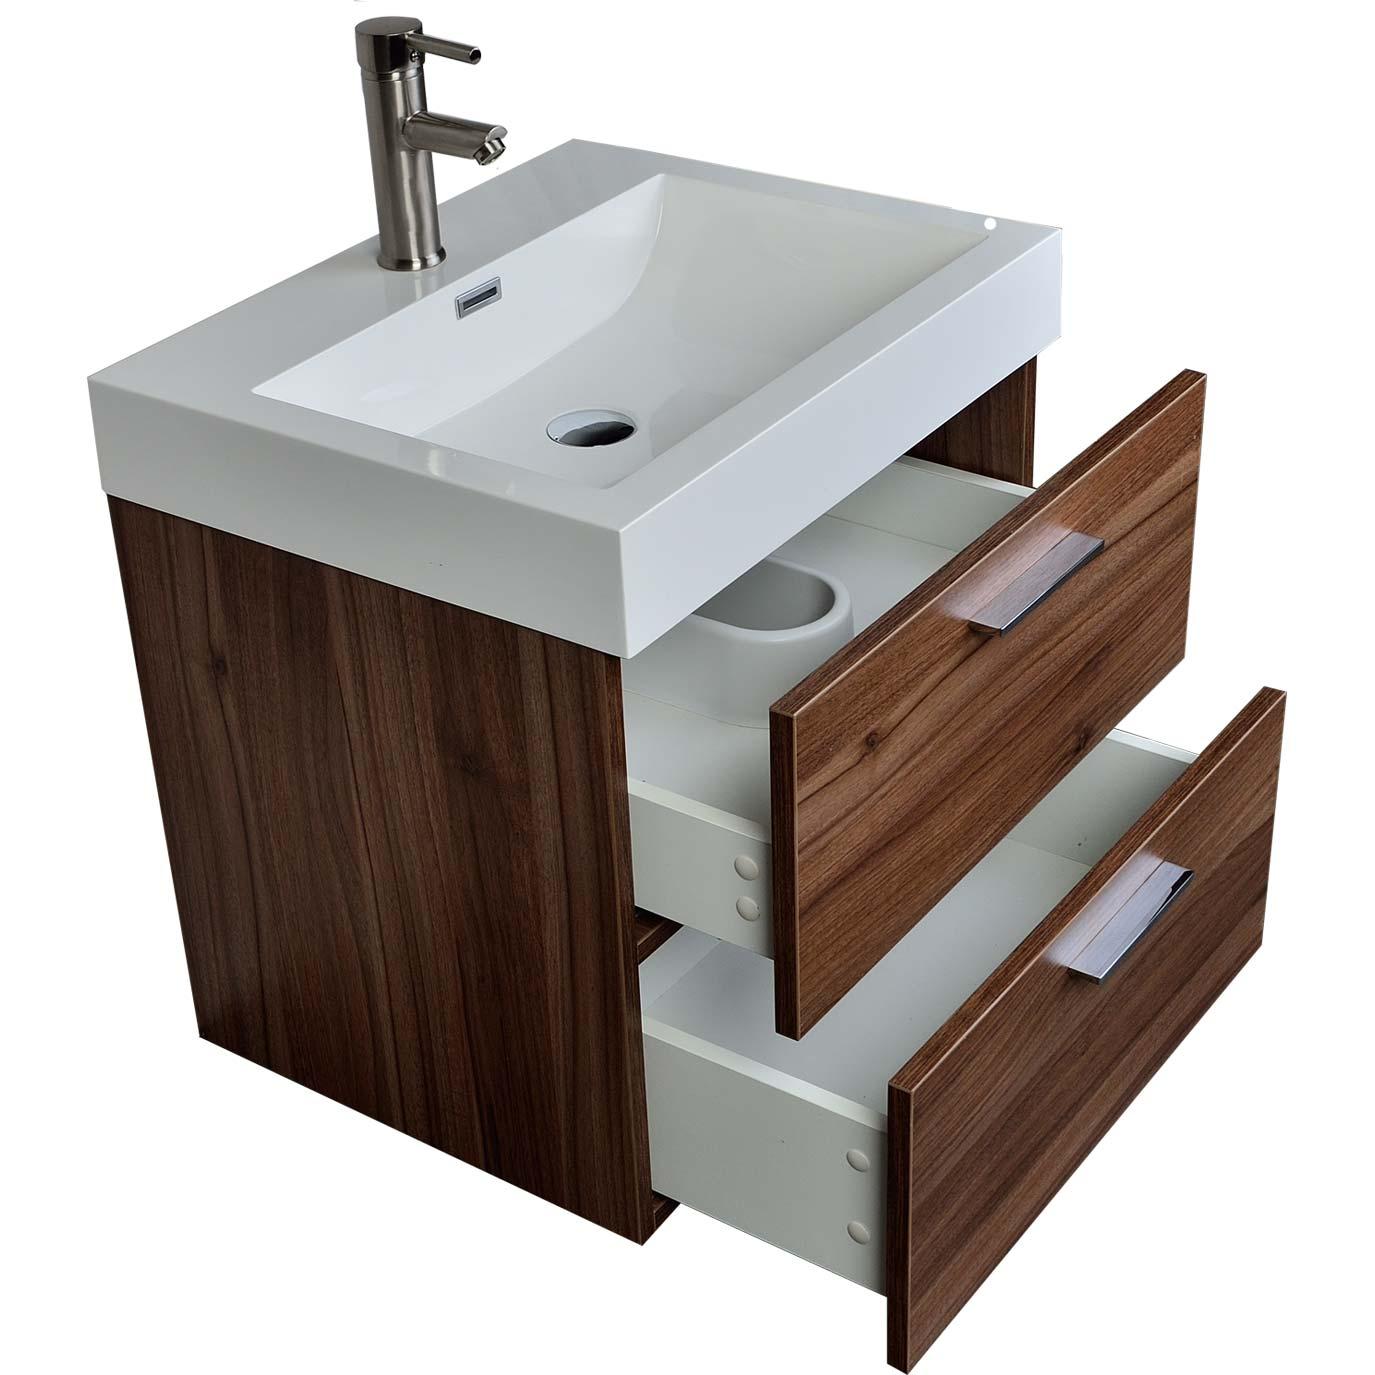 2275 single bathroom vanity set in walnut tn t580 wn